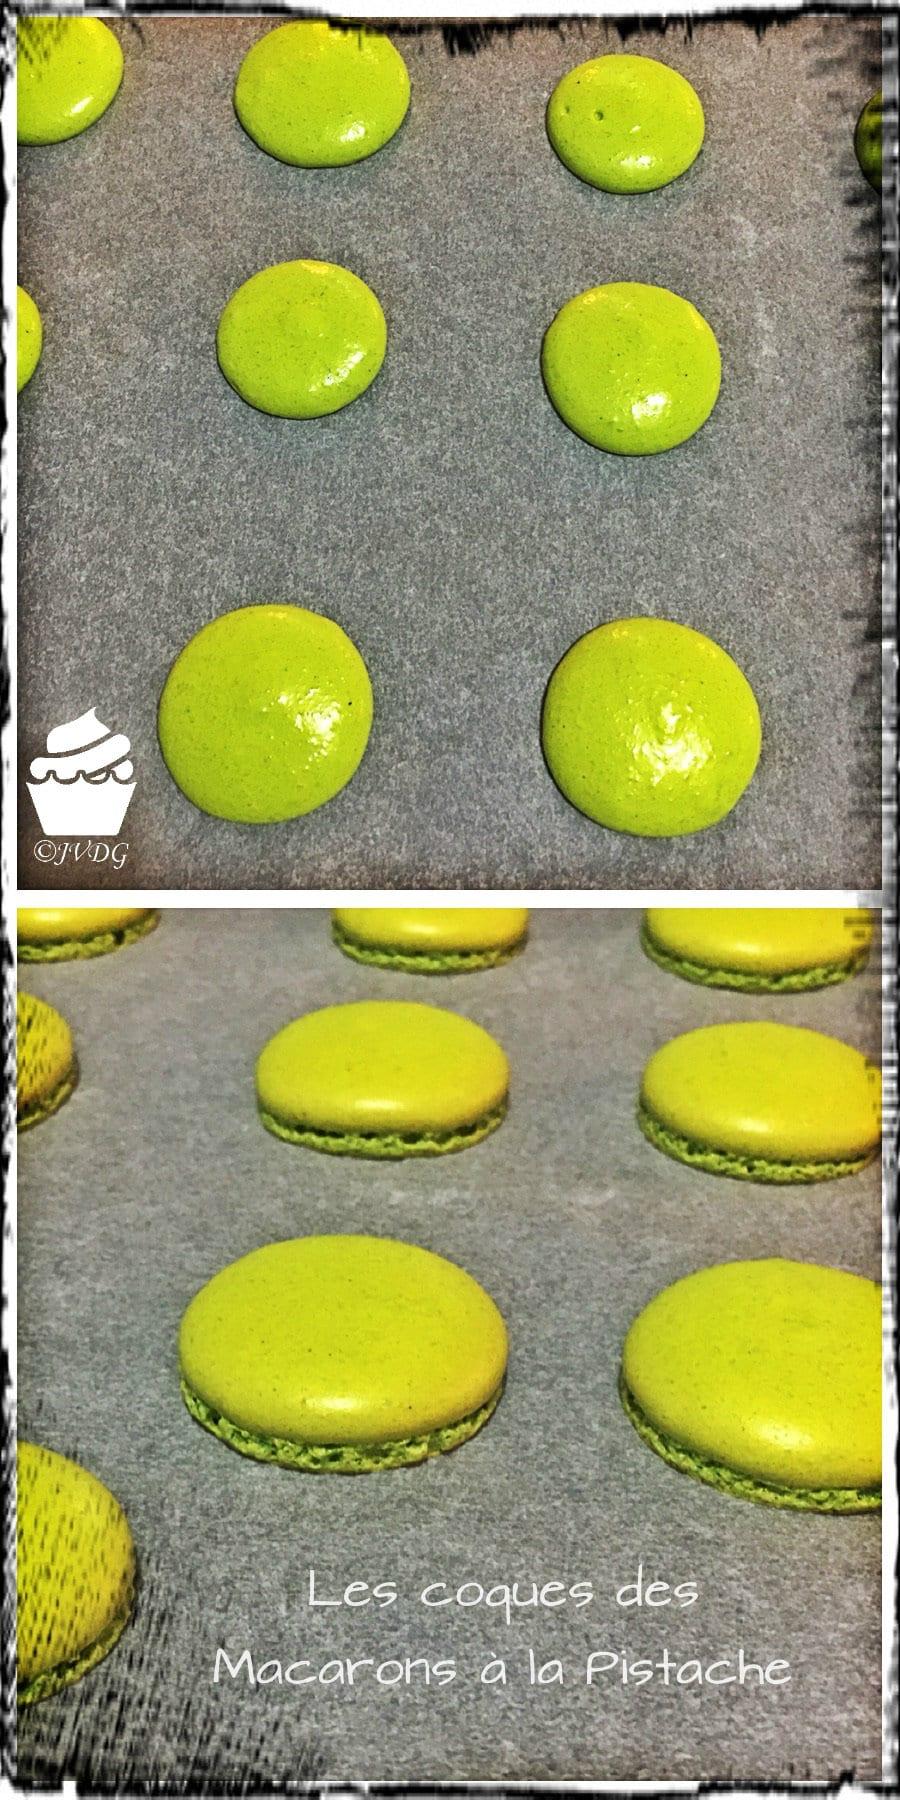 macaron-pistache6